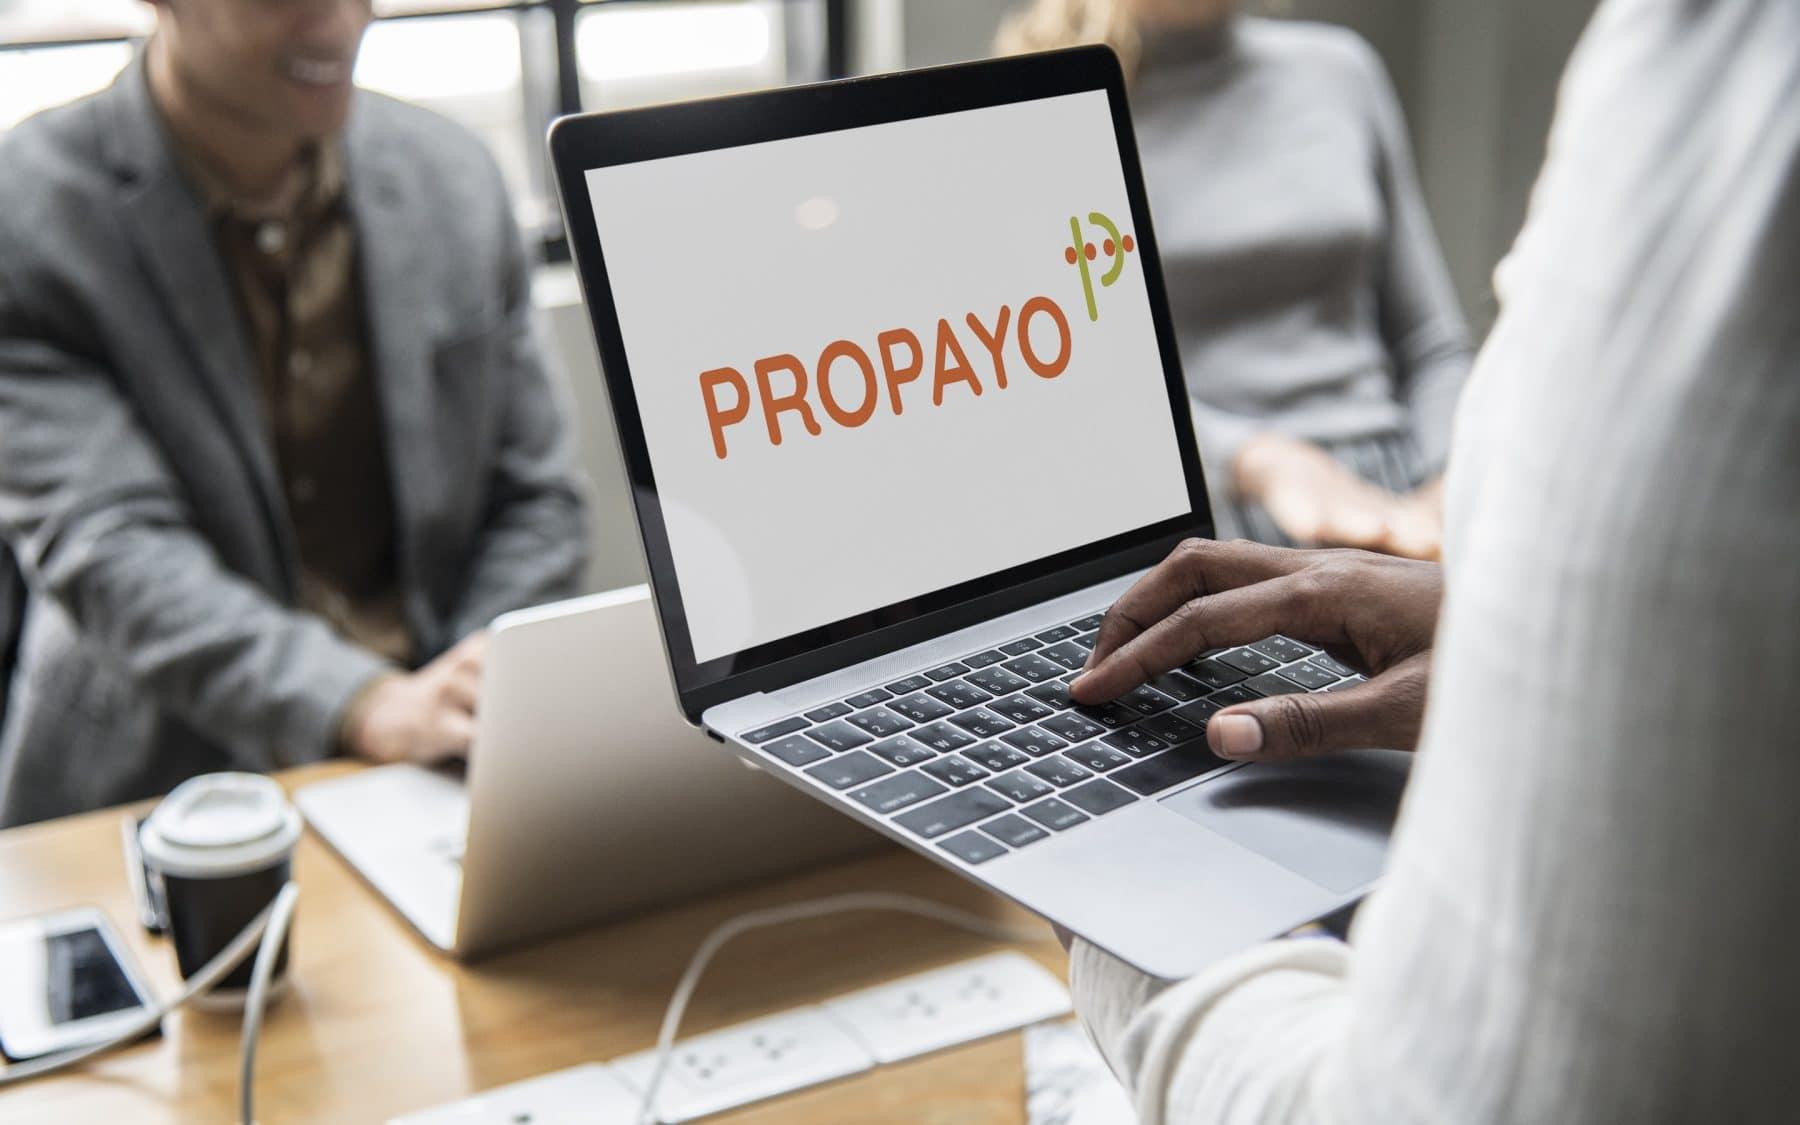 Propayo